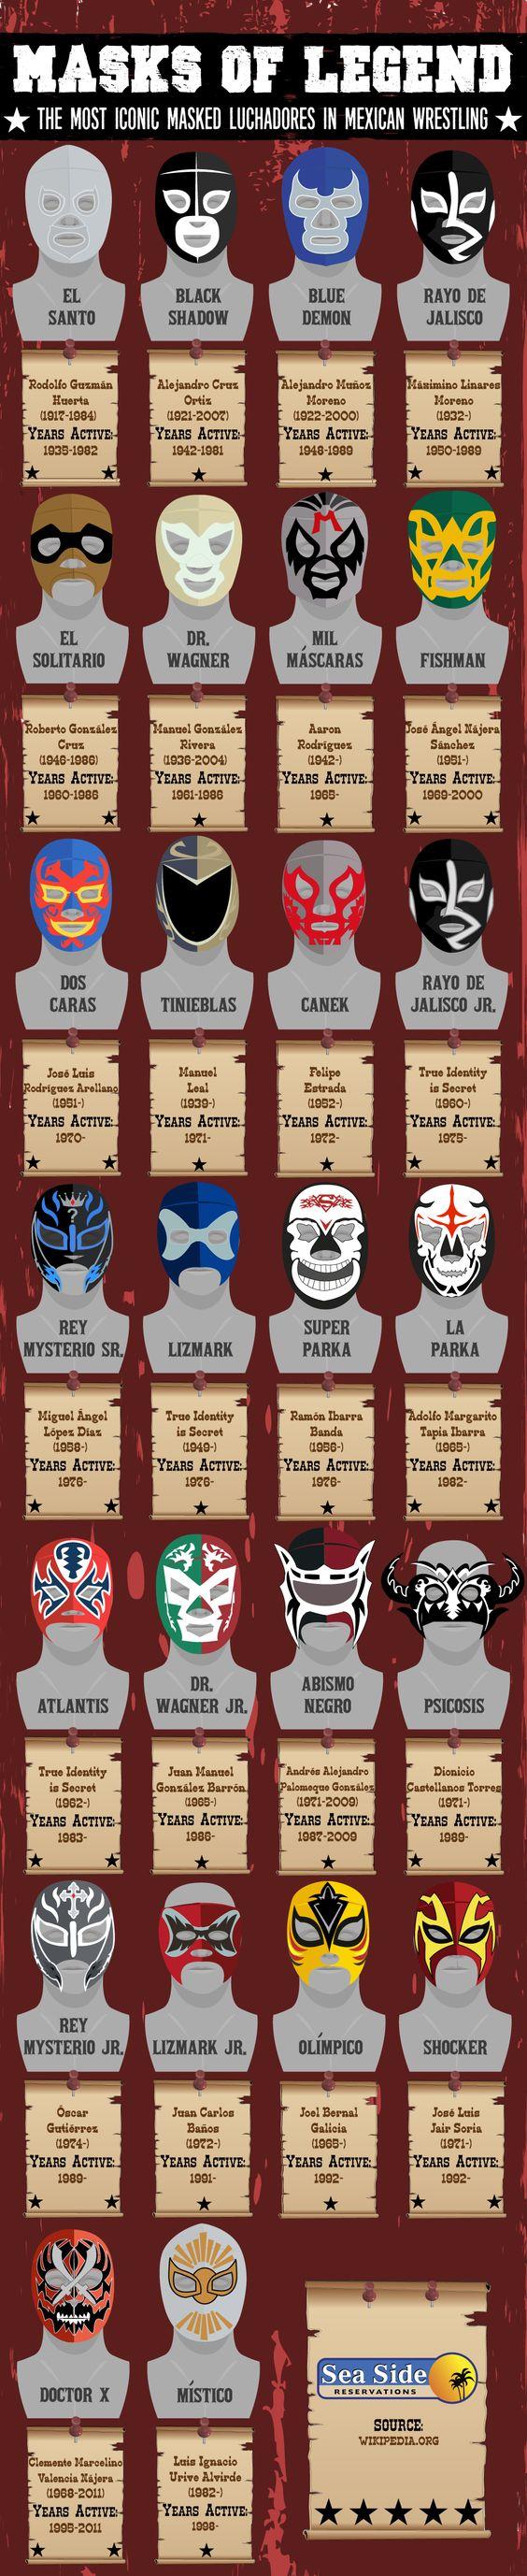 Luchadores in Mexico